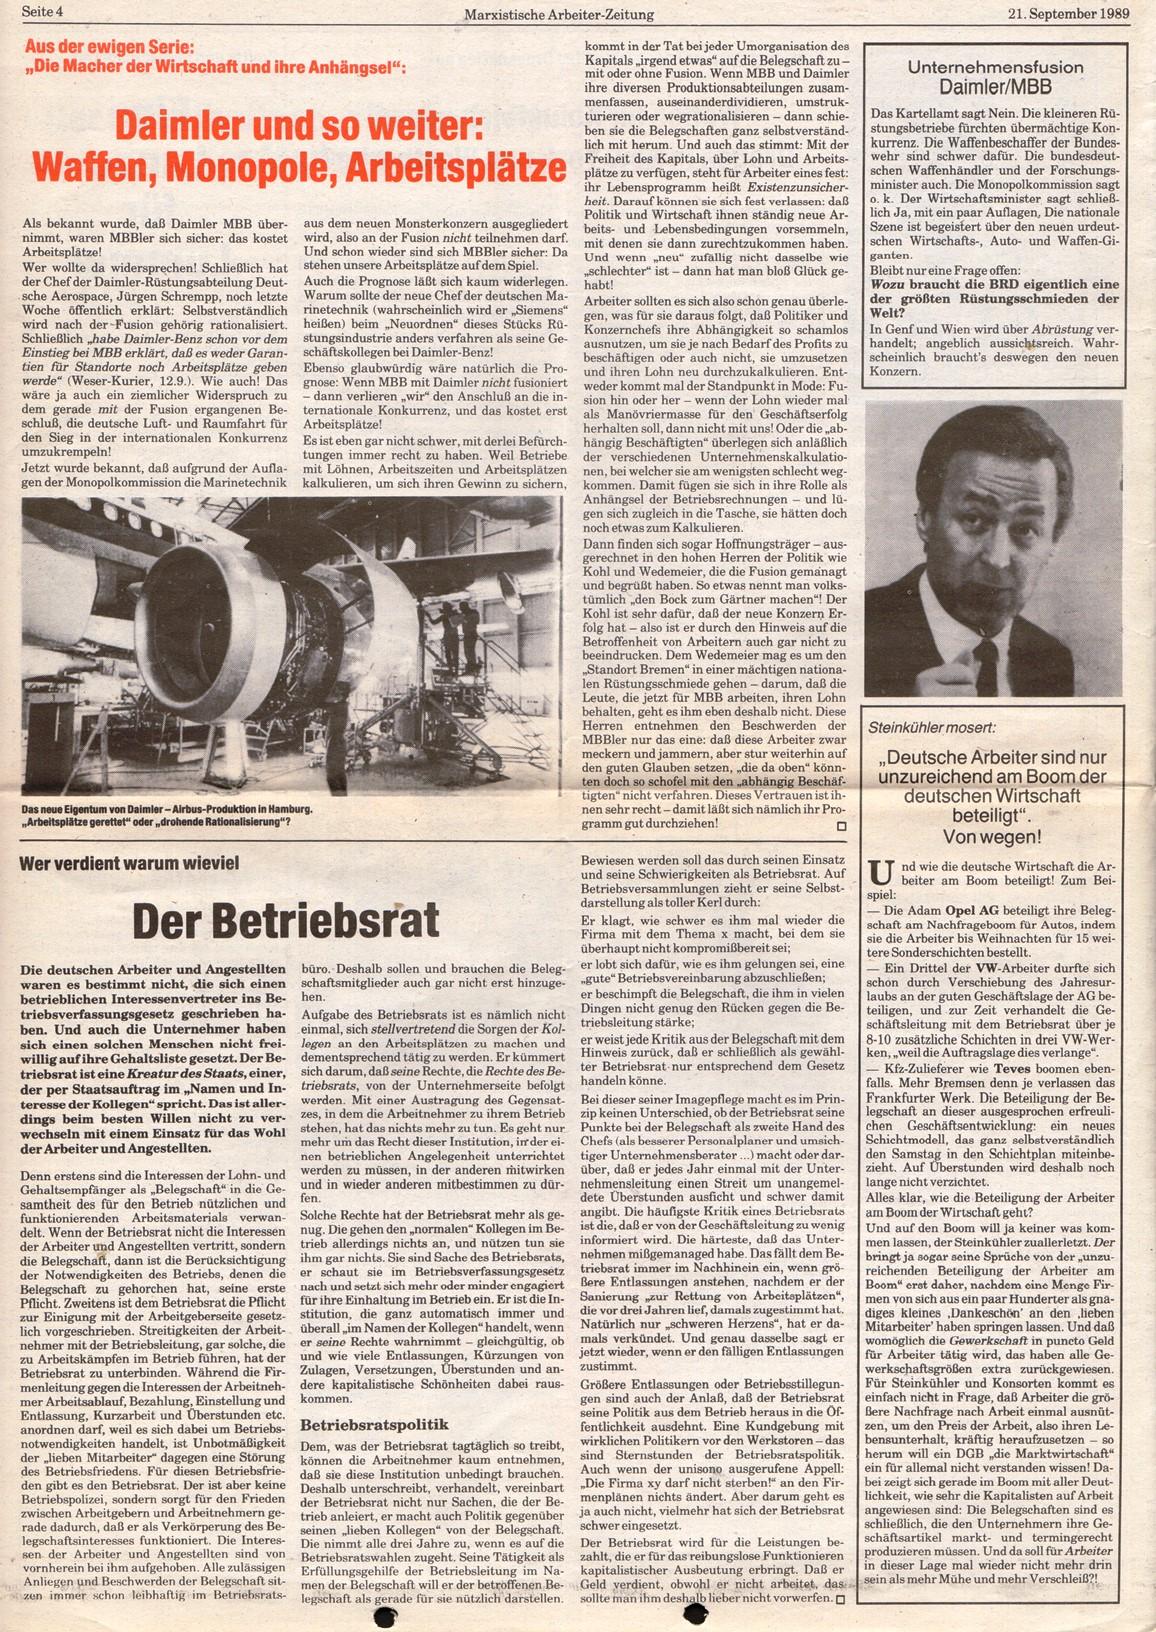 Muenchen_MG_MAZ_19890921_04